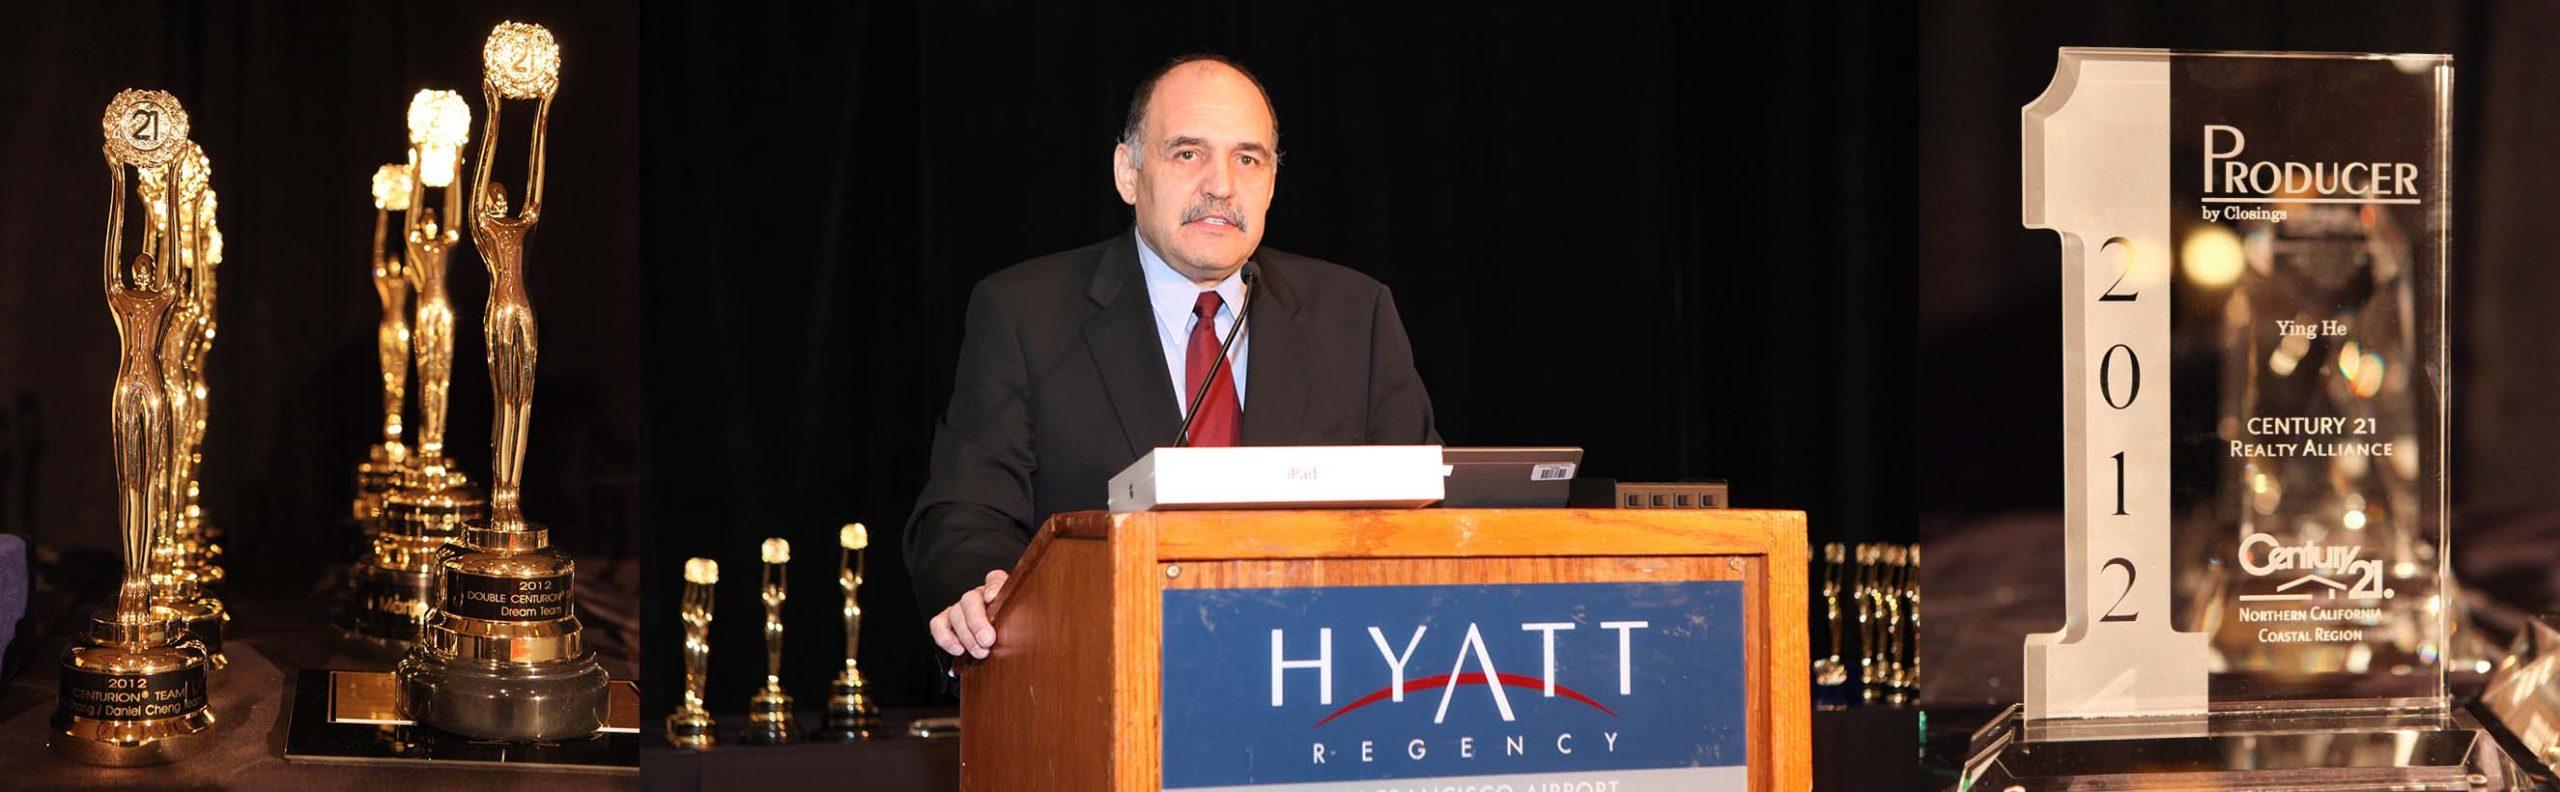 keynote speaker photo for award ceremony